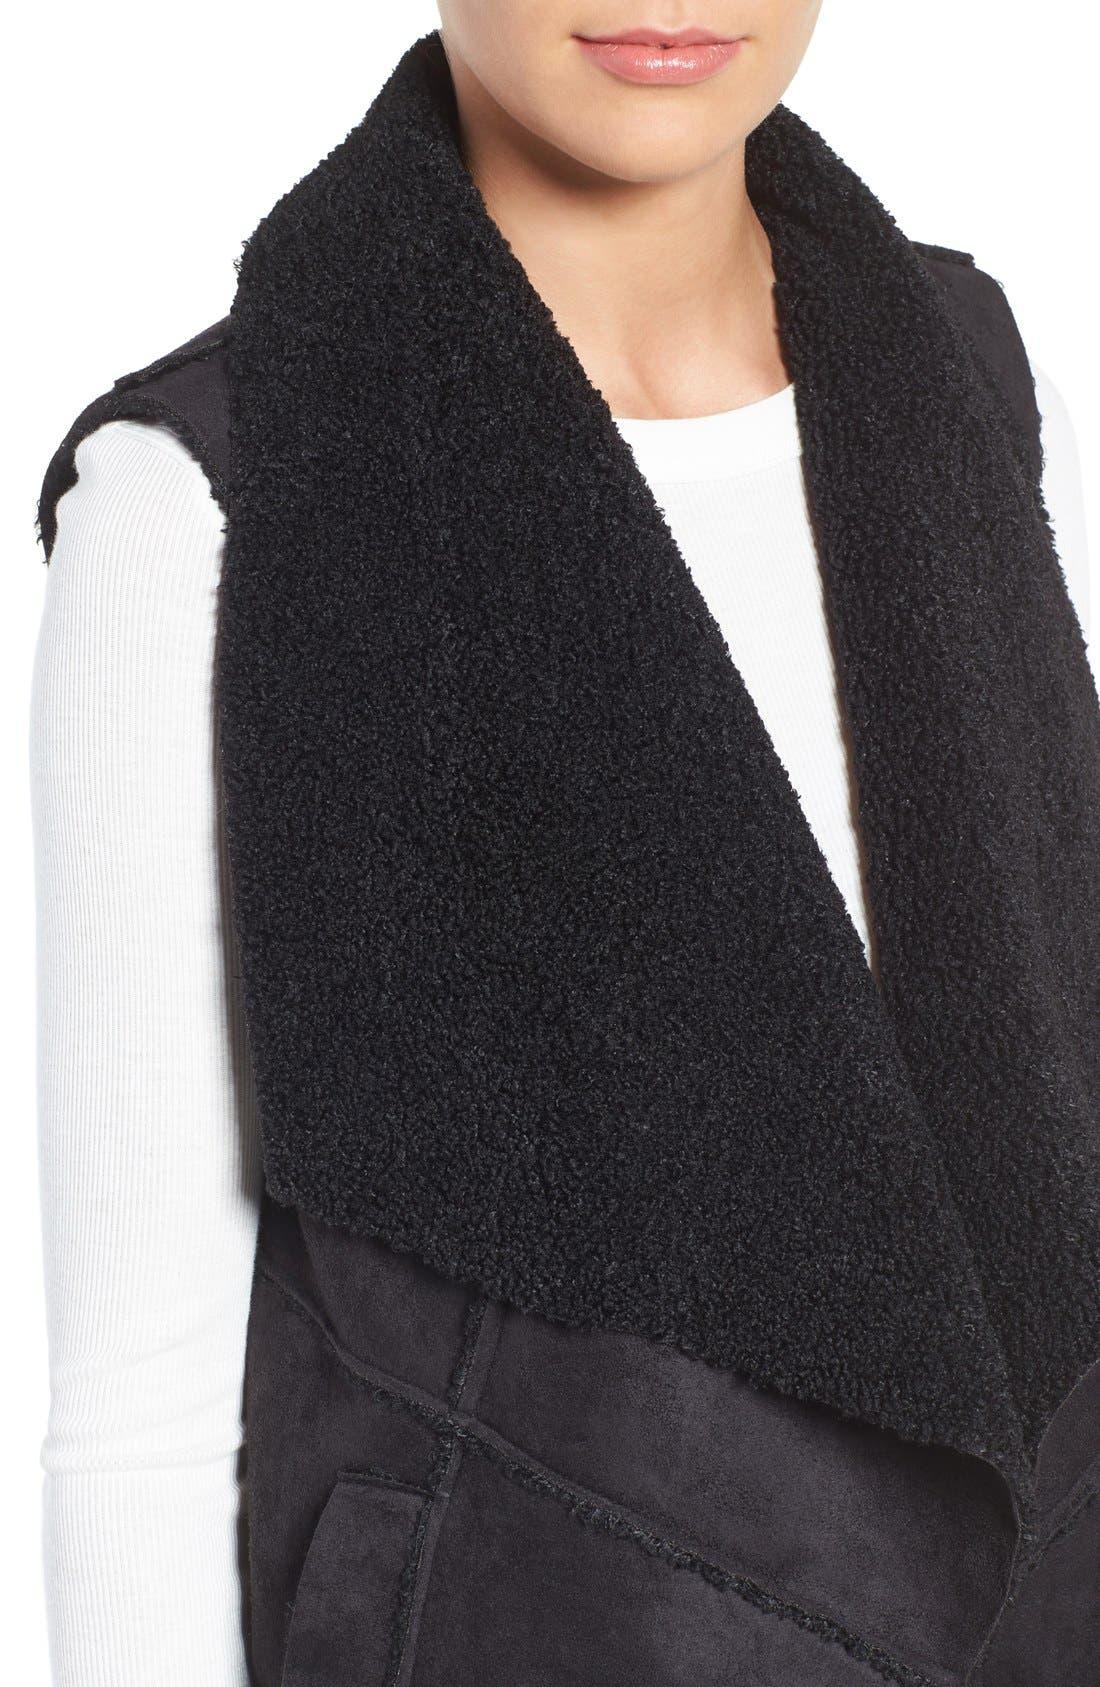 Goslett Faux Shearling Vest,                             Alternate thumbnail 4, color,                             001